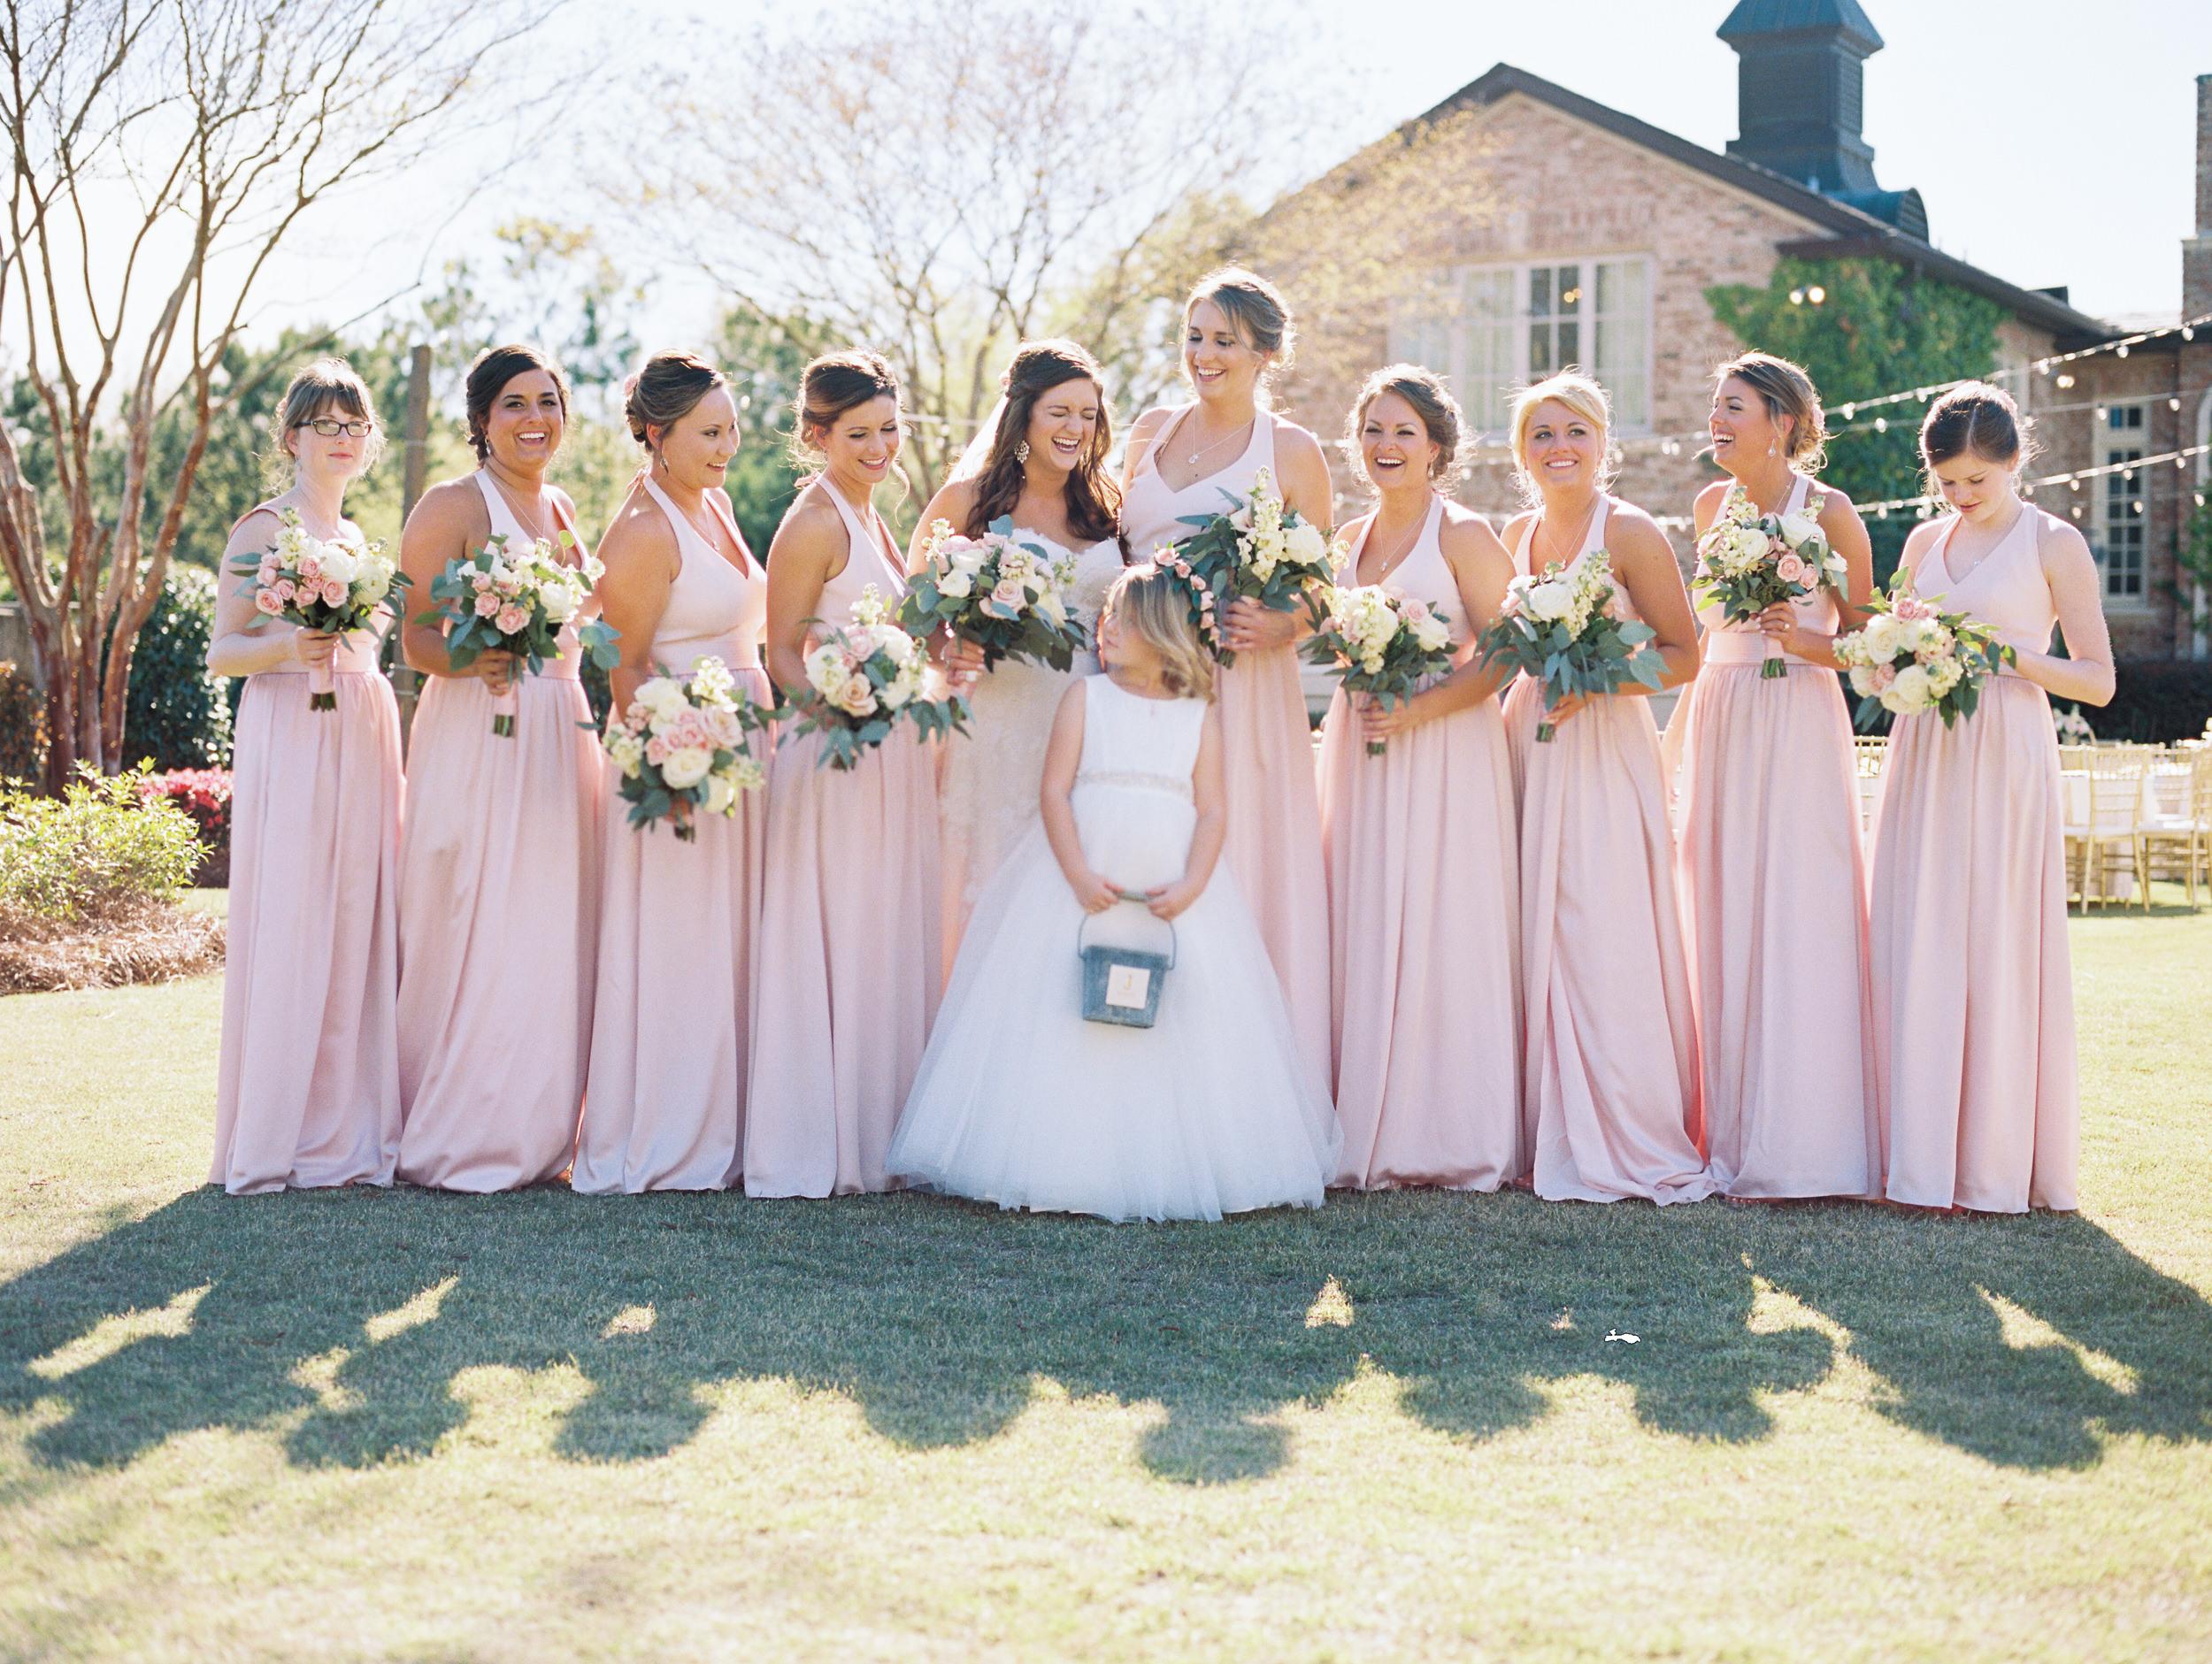 KM_Wedding_Film-002.jpg